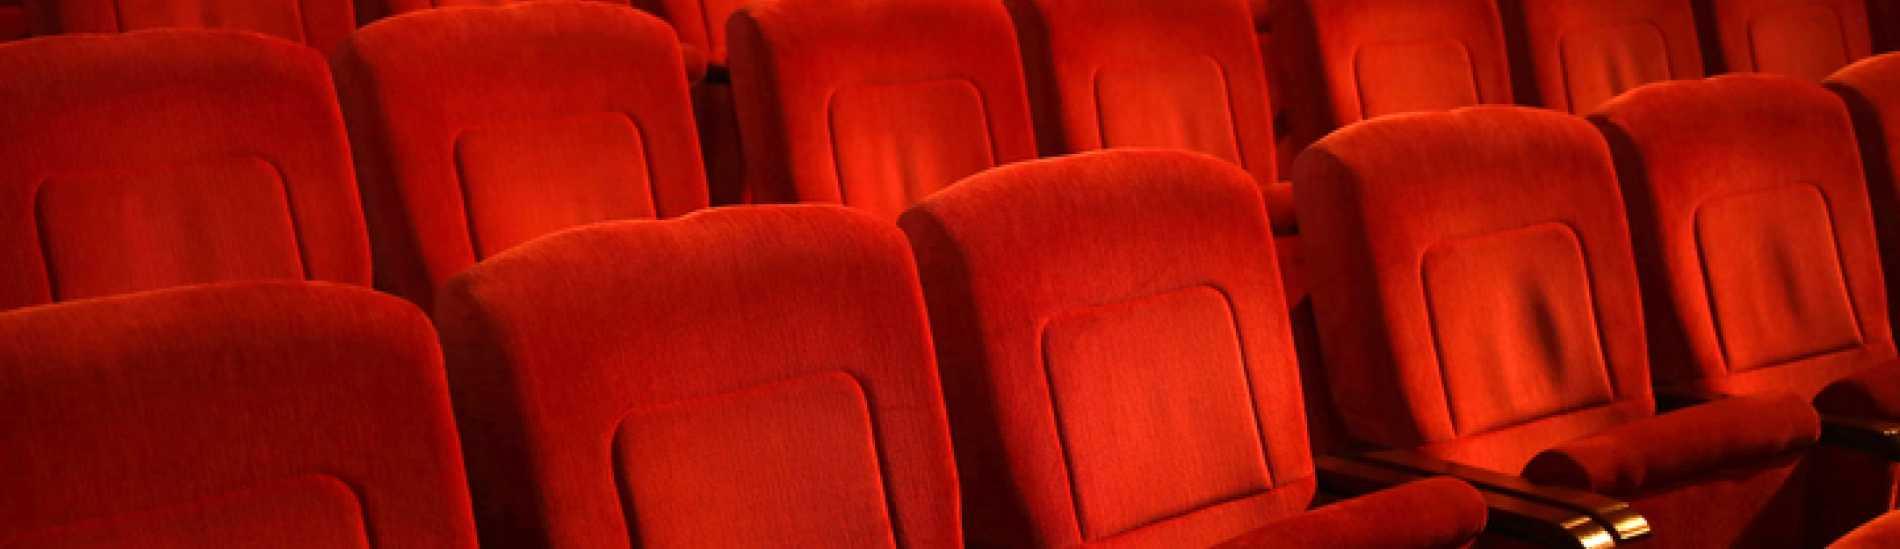 Outdoor Cinemas - Perfect for Dubai's Cooler Months